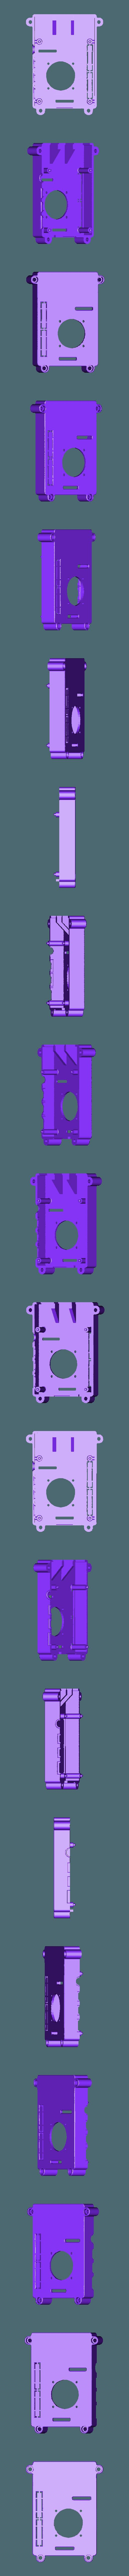 FULL_30MM_SLOTTED_BLANK.STL Télécharger fichier STL gratuit Étui Pi 4B Framboise Framboise • Objet pour imprimante 3D, mkellsy